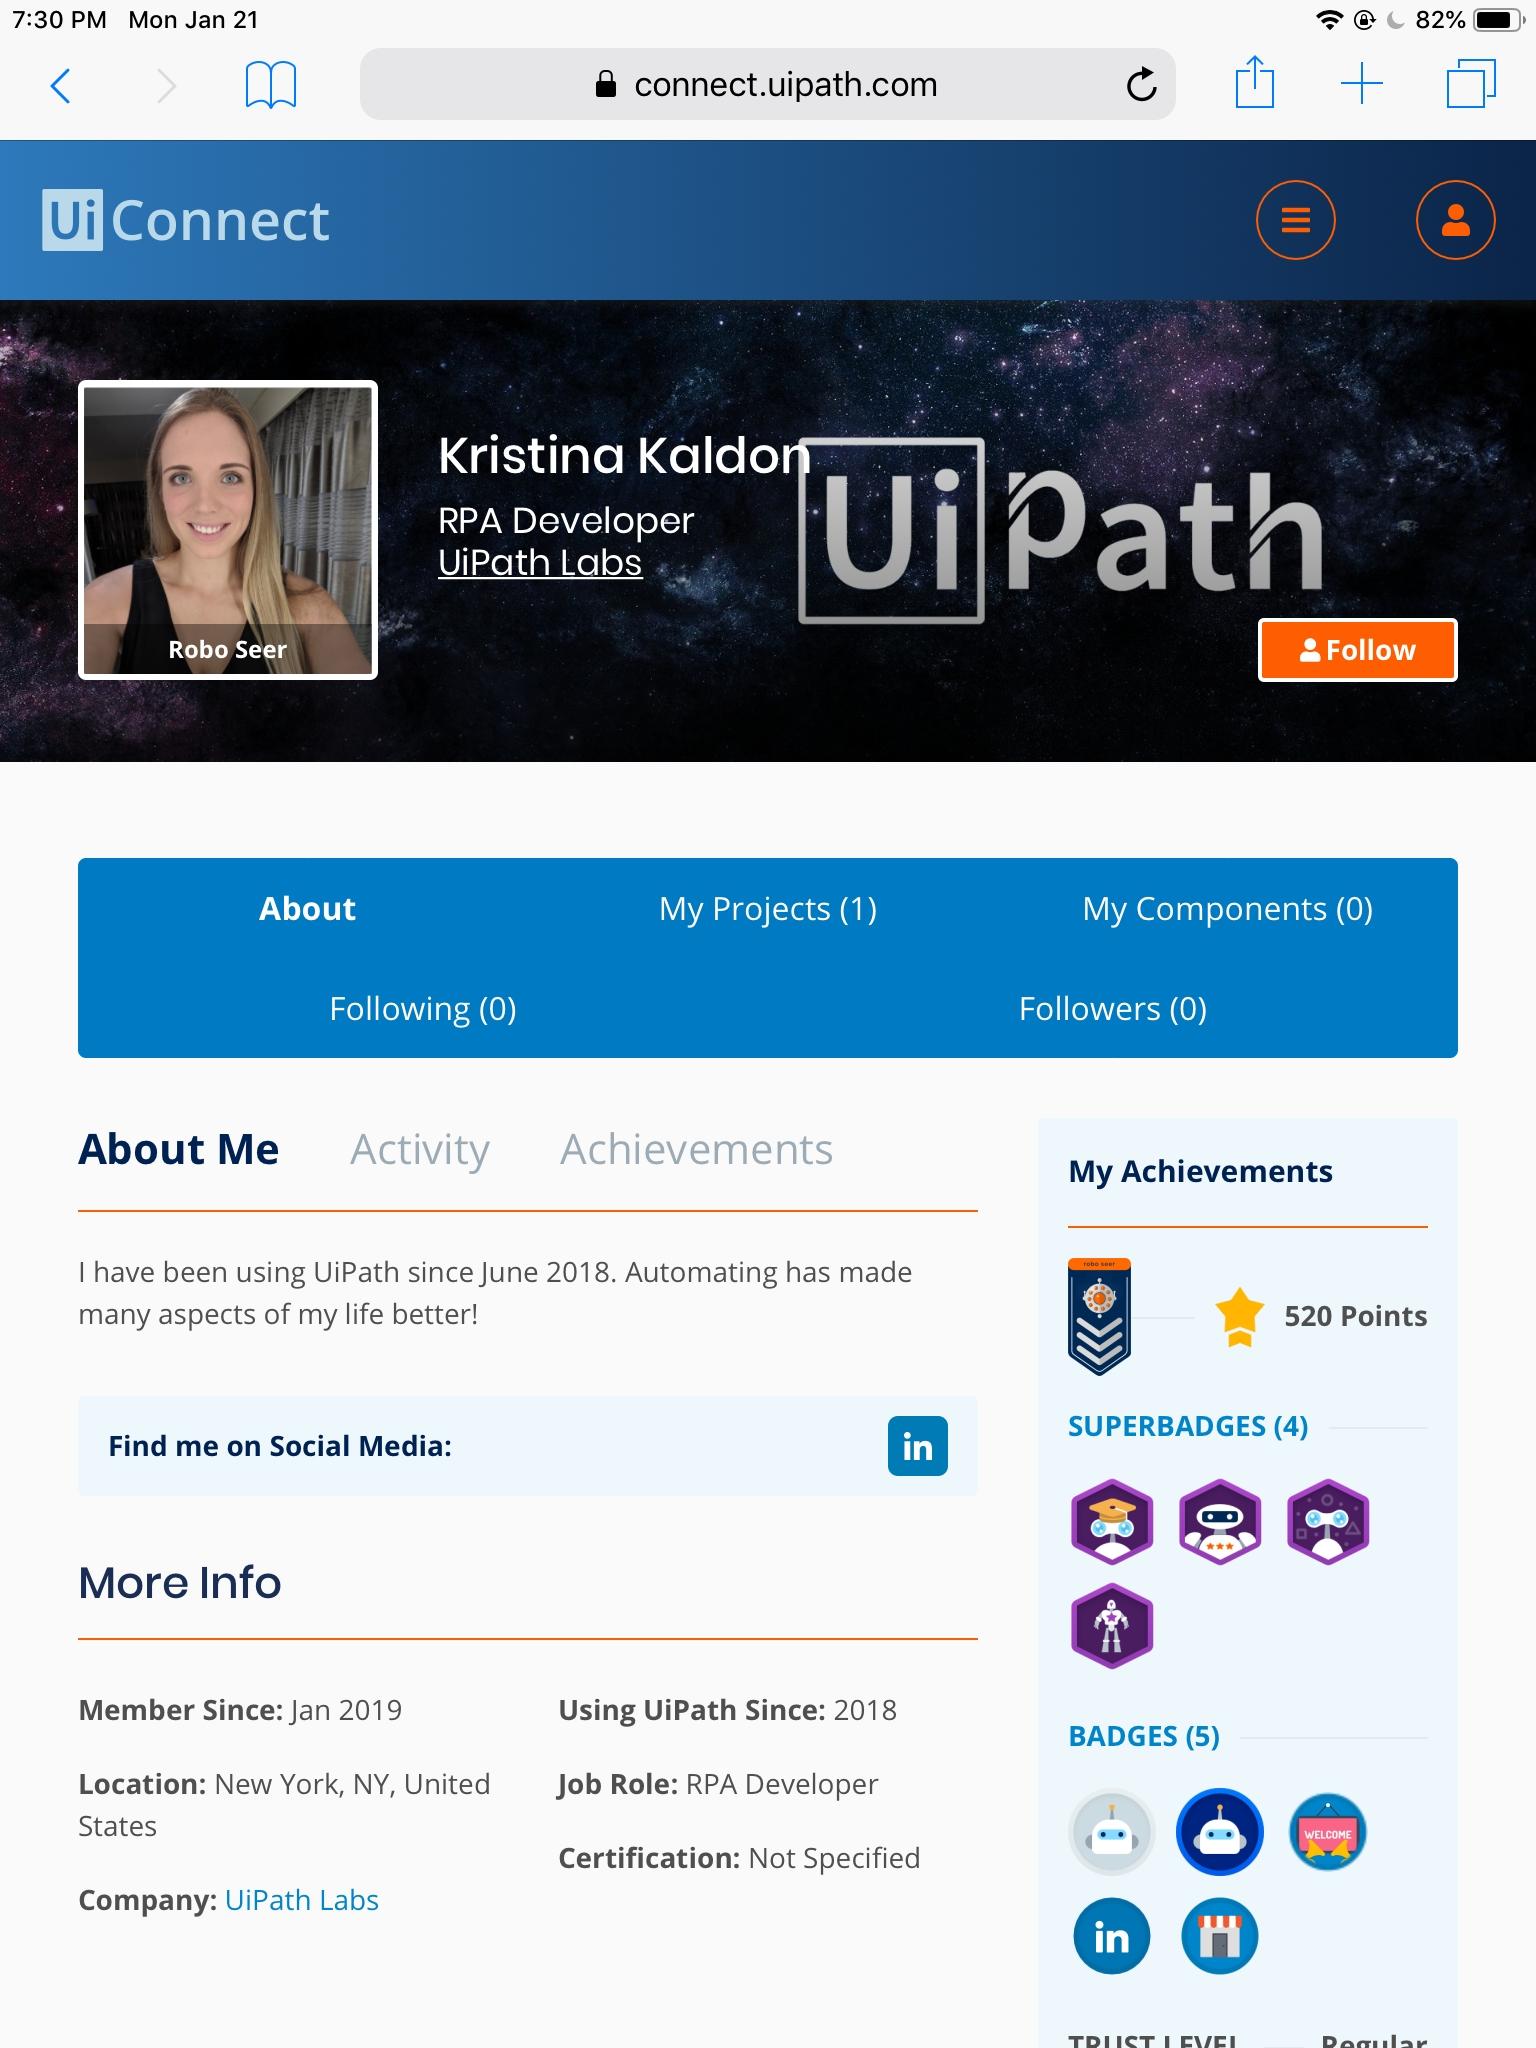 RPA Professionals Unite on New UiPath Connect! Online Platform